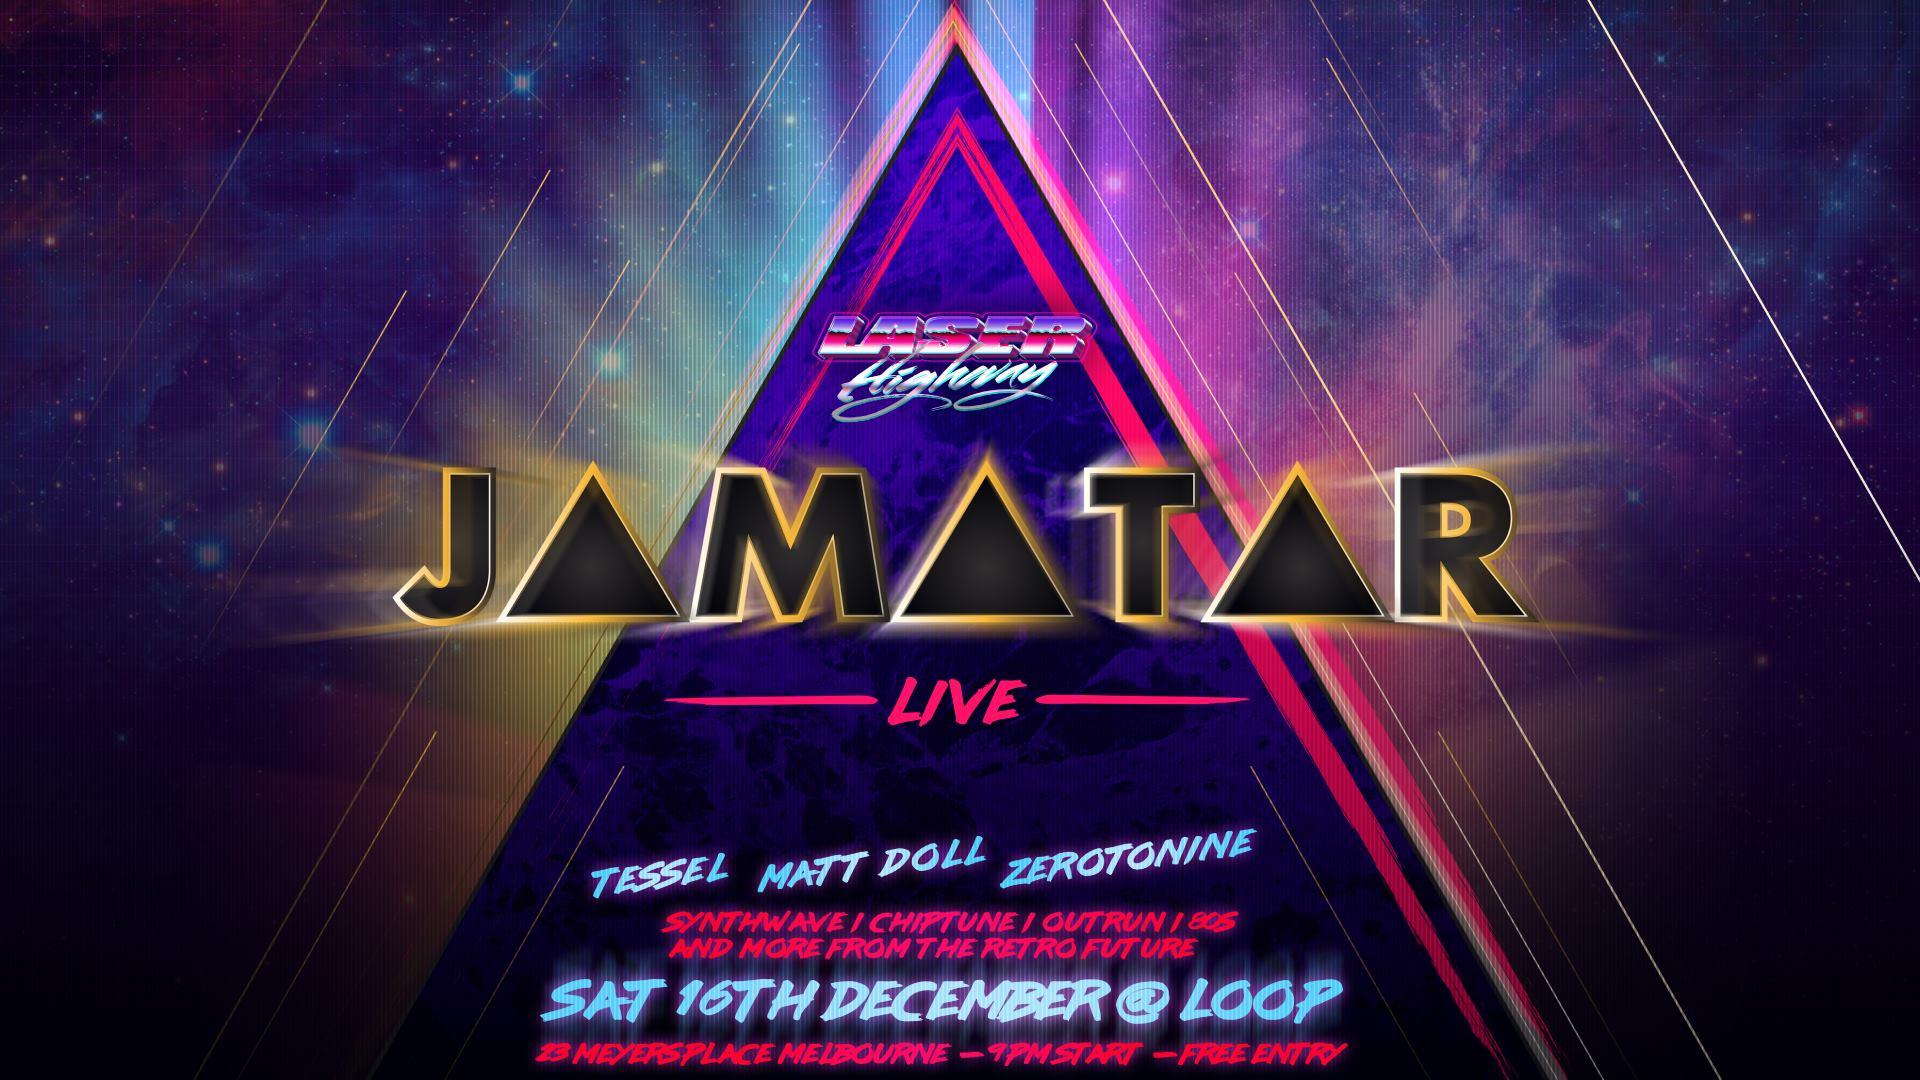 Laser Highway 34: Jamatar Live / Tessel / Matt Doll / Zerotonine